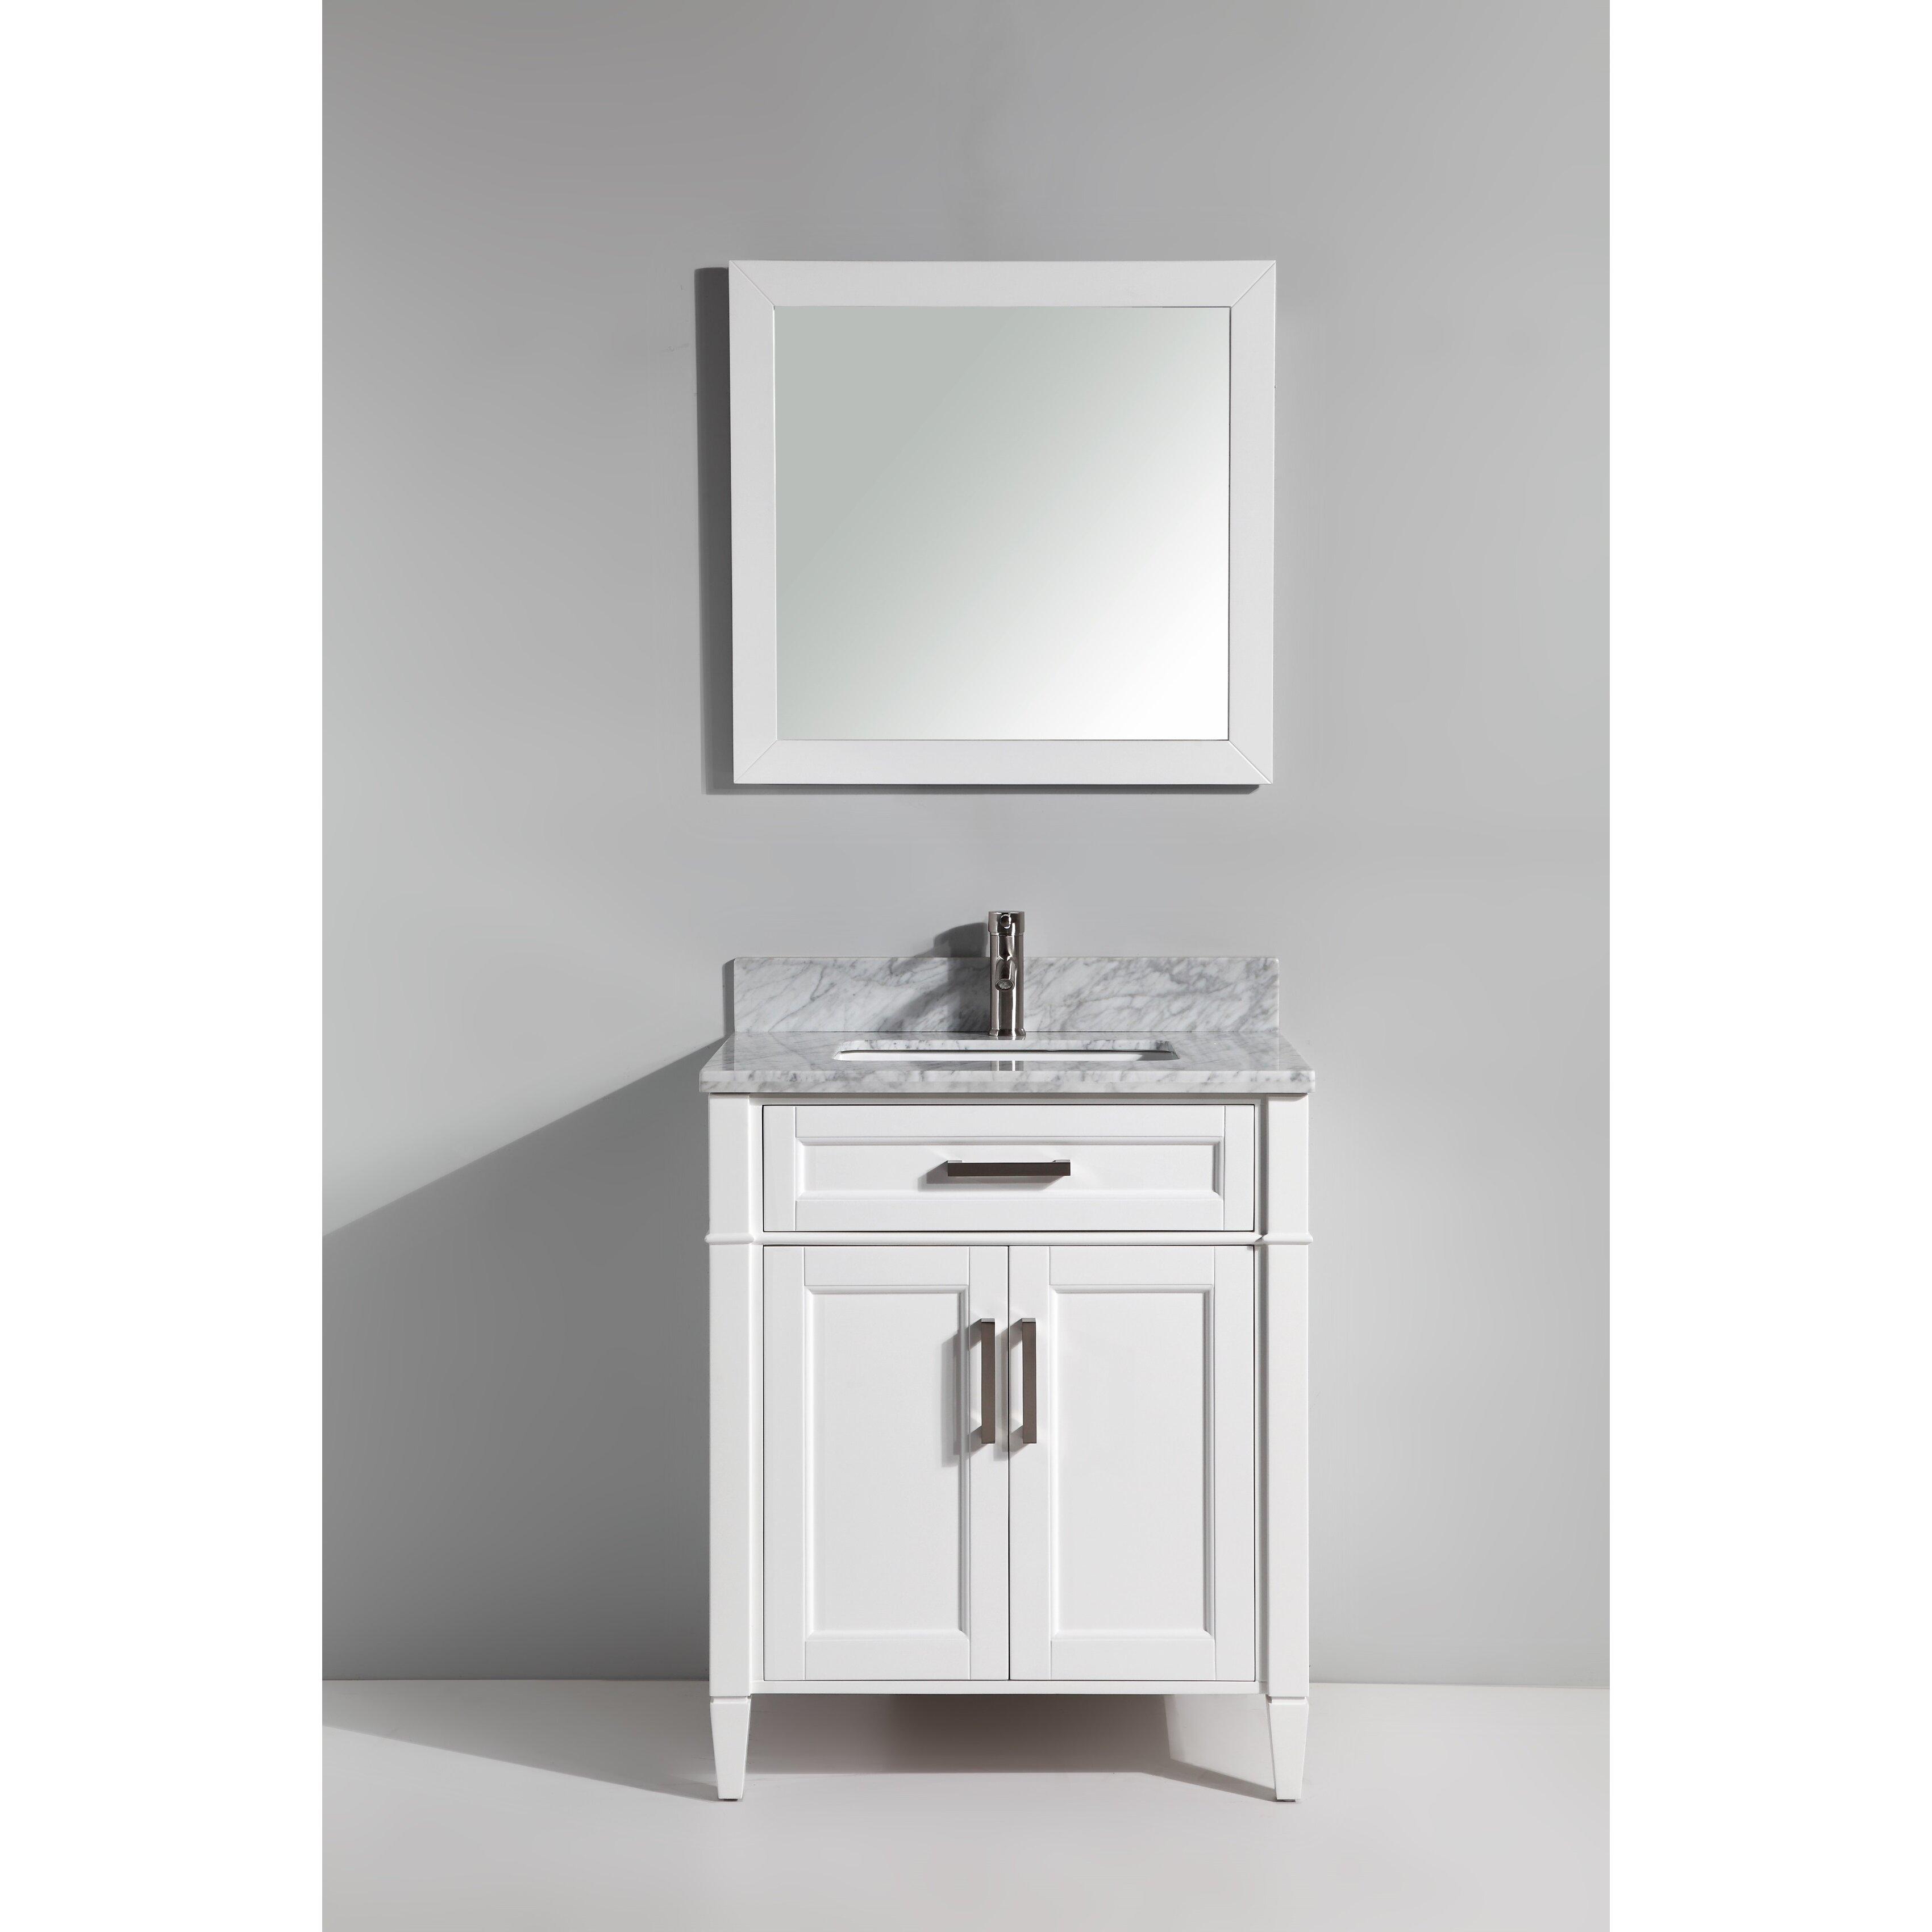 30 Bathroom Cabinet Vanity Art Carrara Marble 30 Single Bathroom Vanity With Mirror